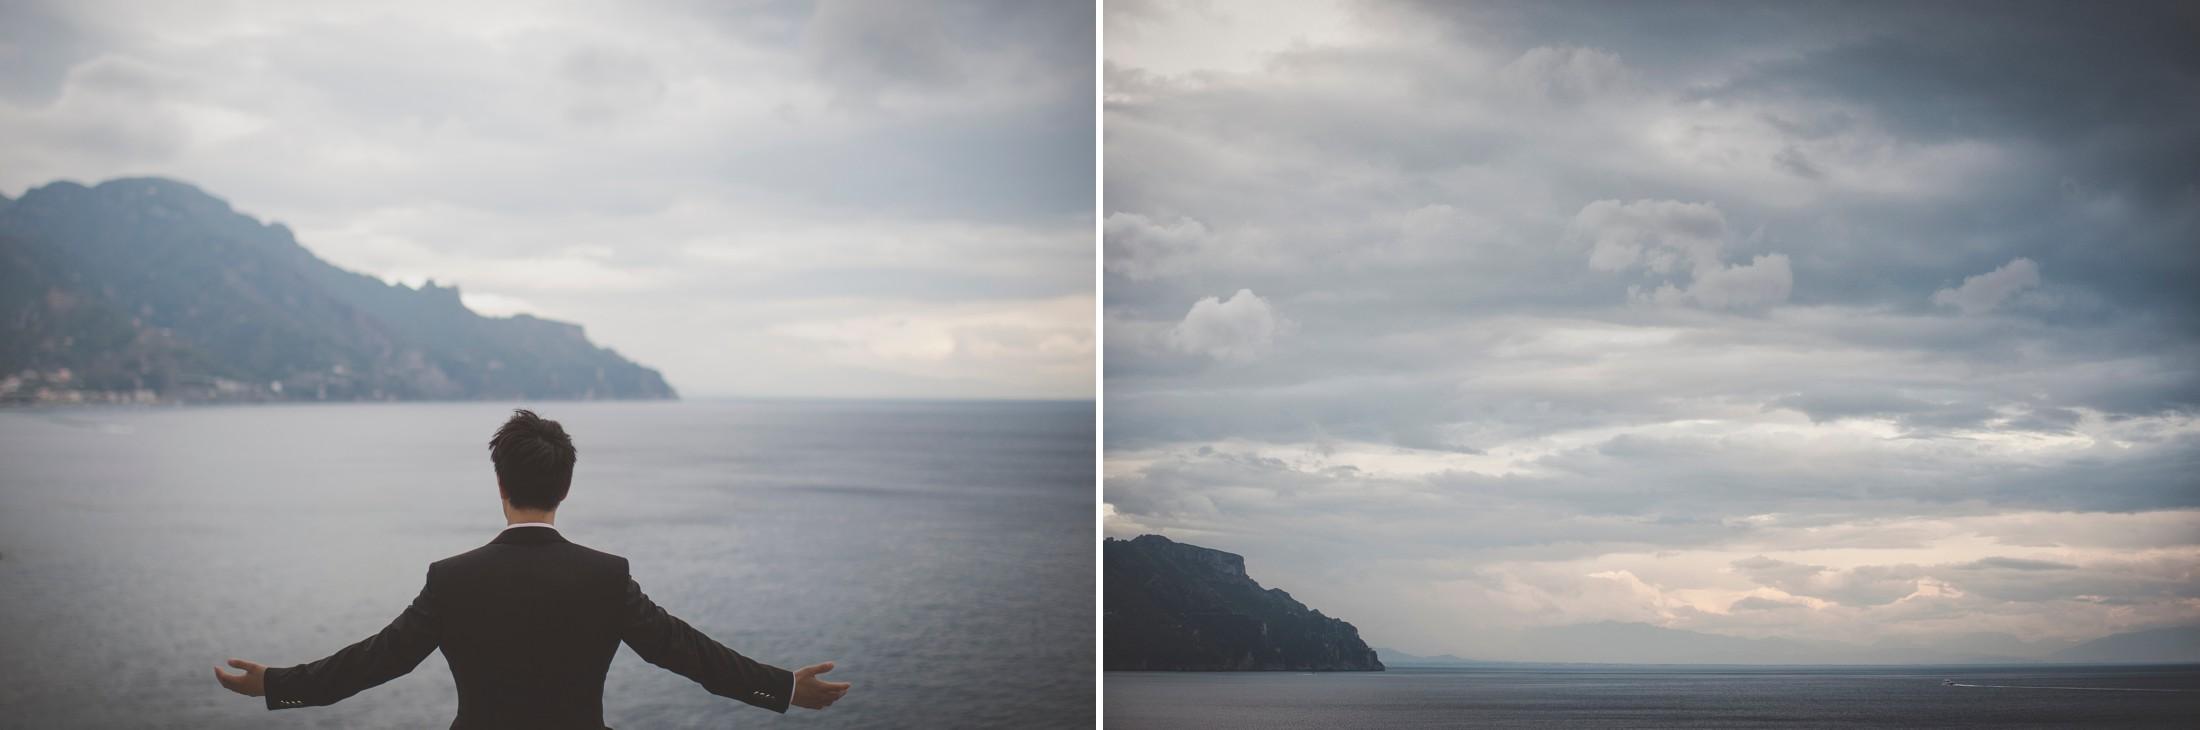 wedding on the amalfi coast the groom looking at the sea